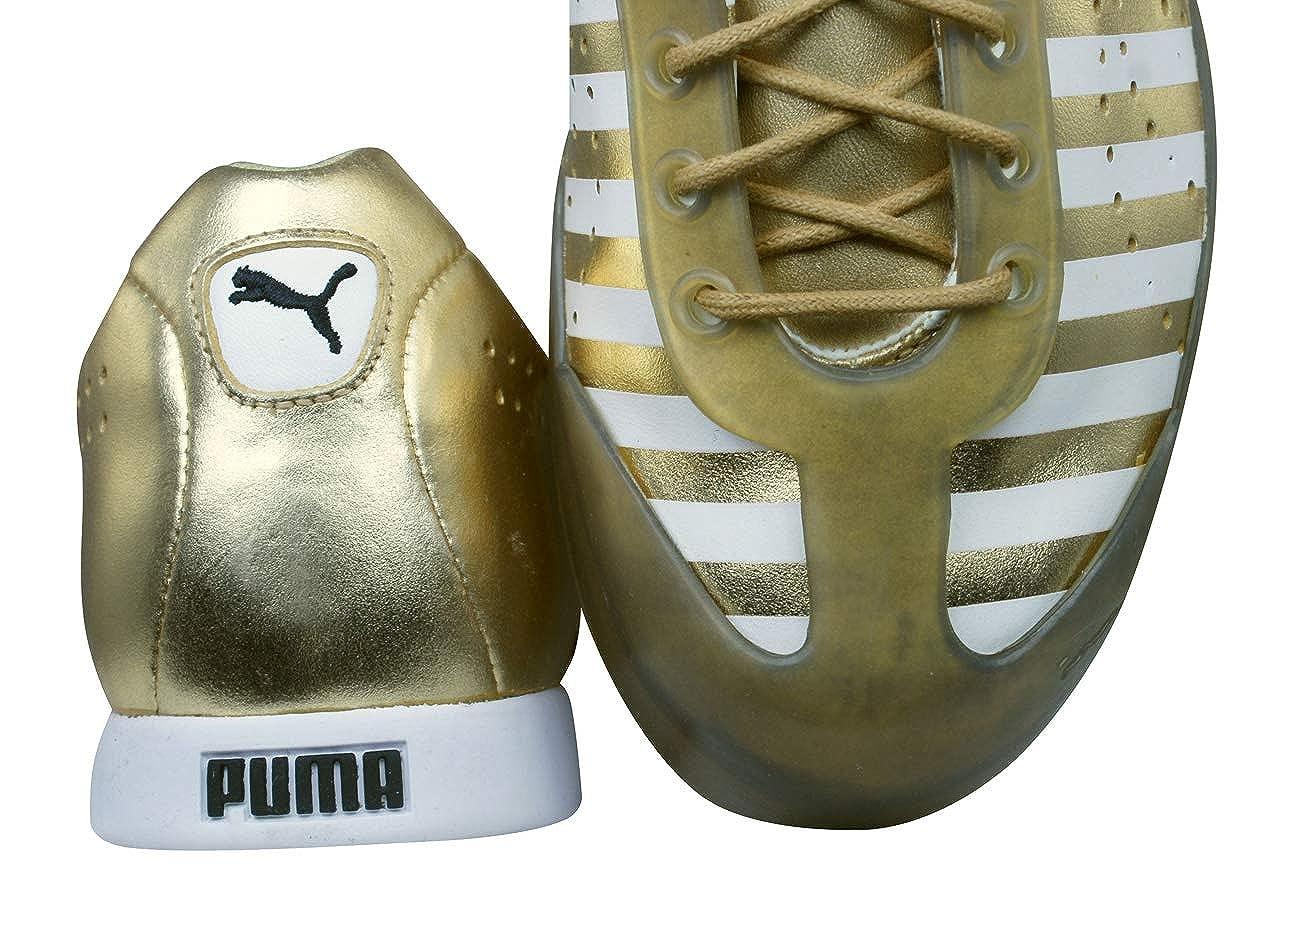 Puma Mihara Yasuhiro My 28 Baskets Hommes Gold 37: